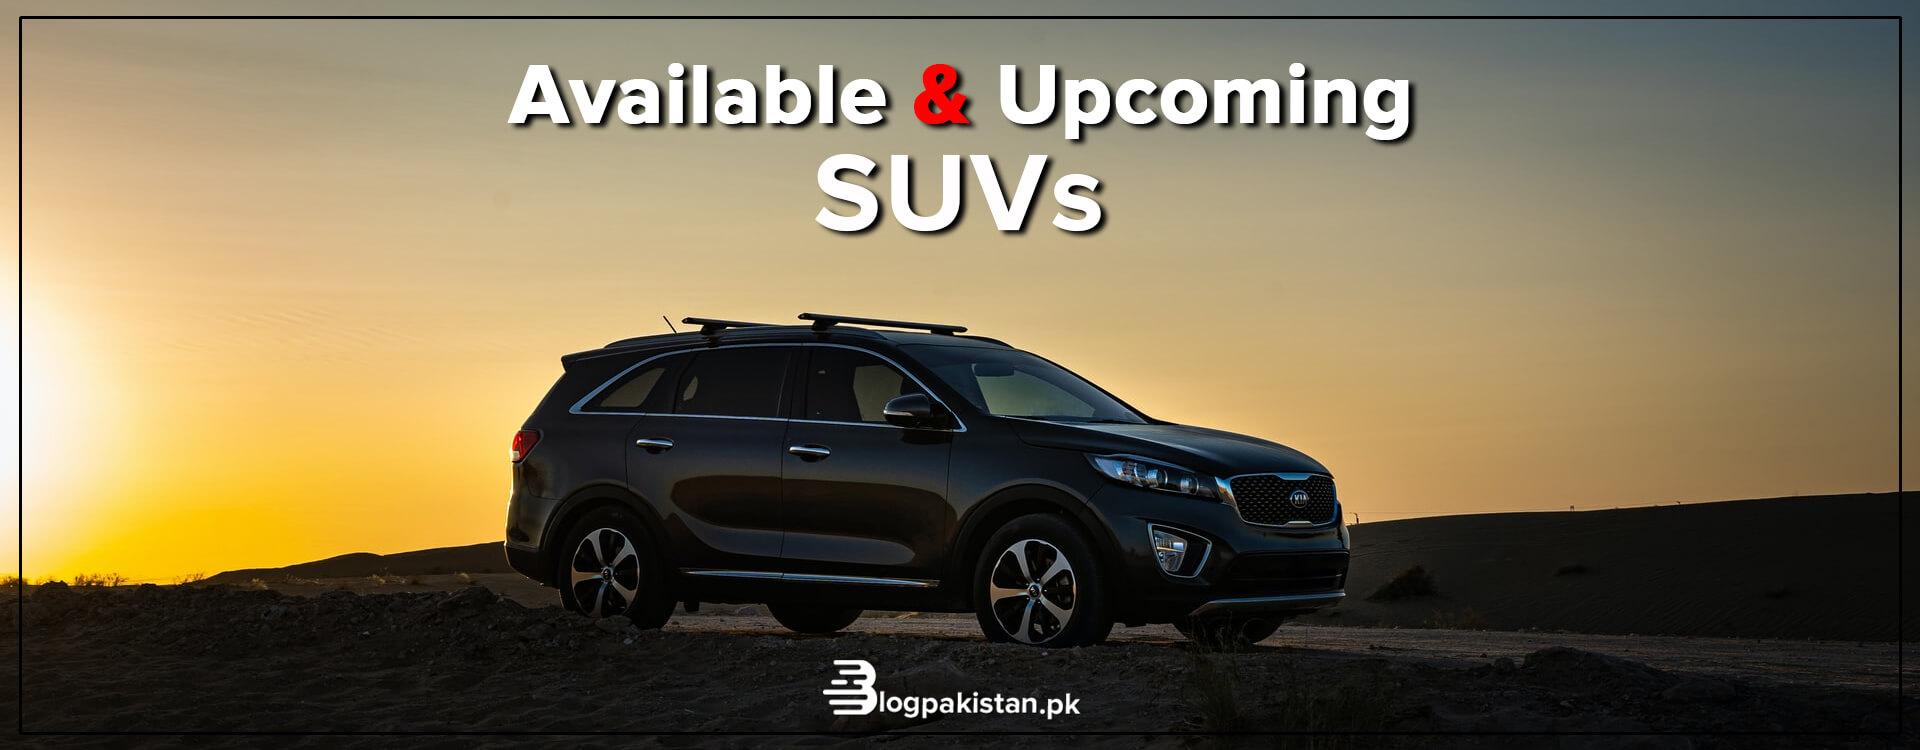 SUVs in pakistan